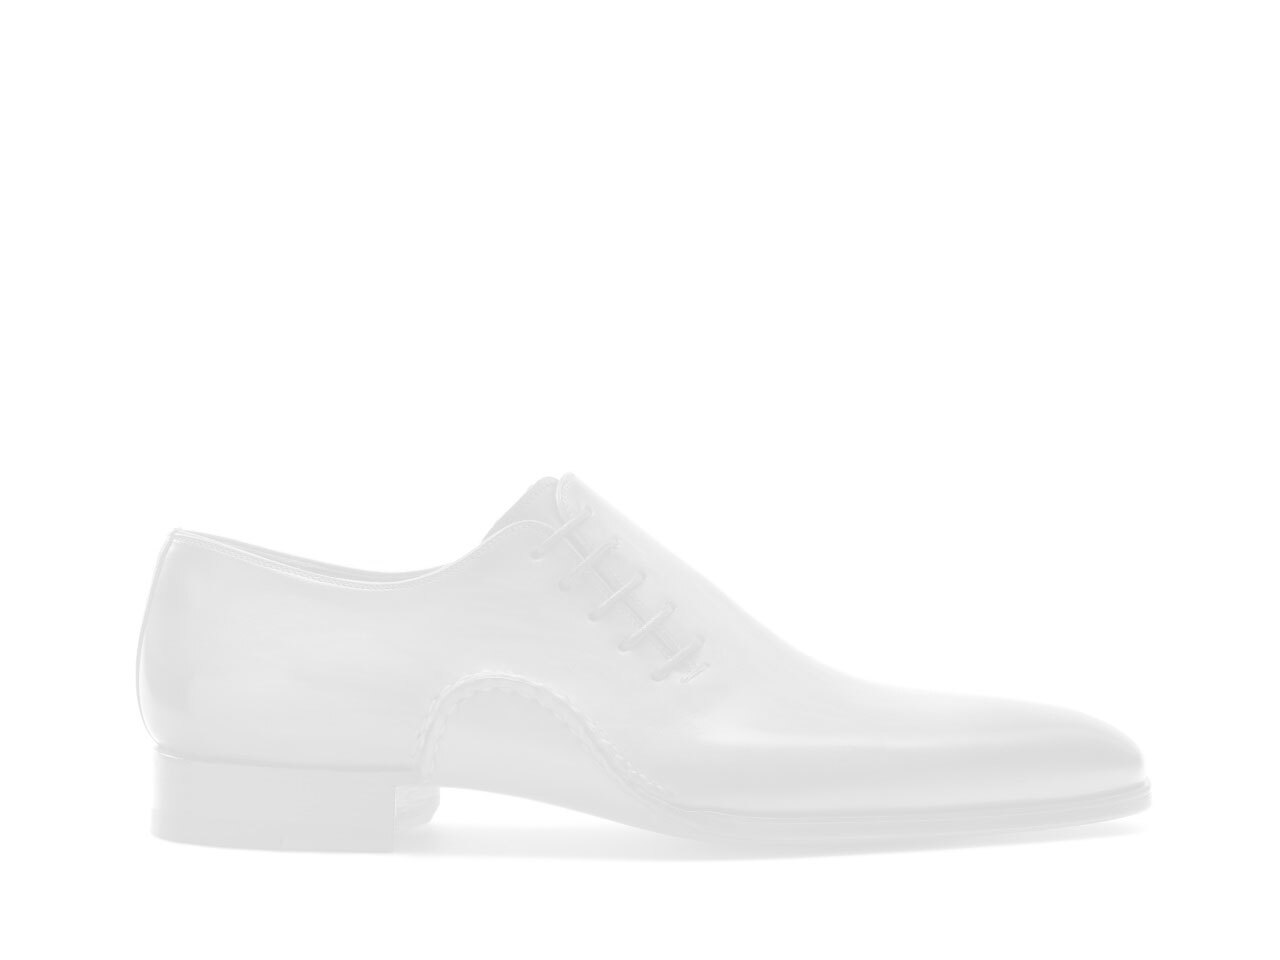 Essential Shoe Care Kit | Black